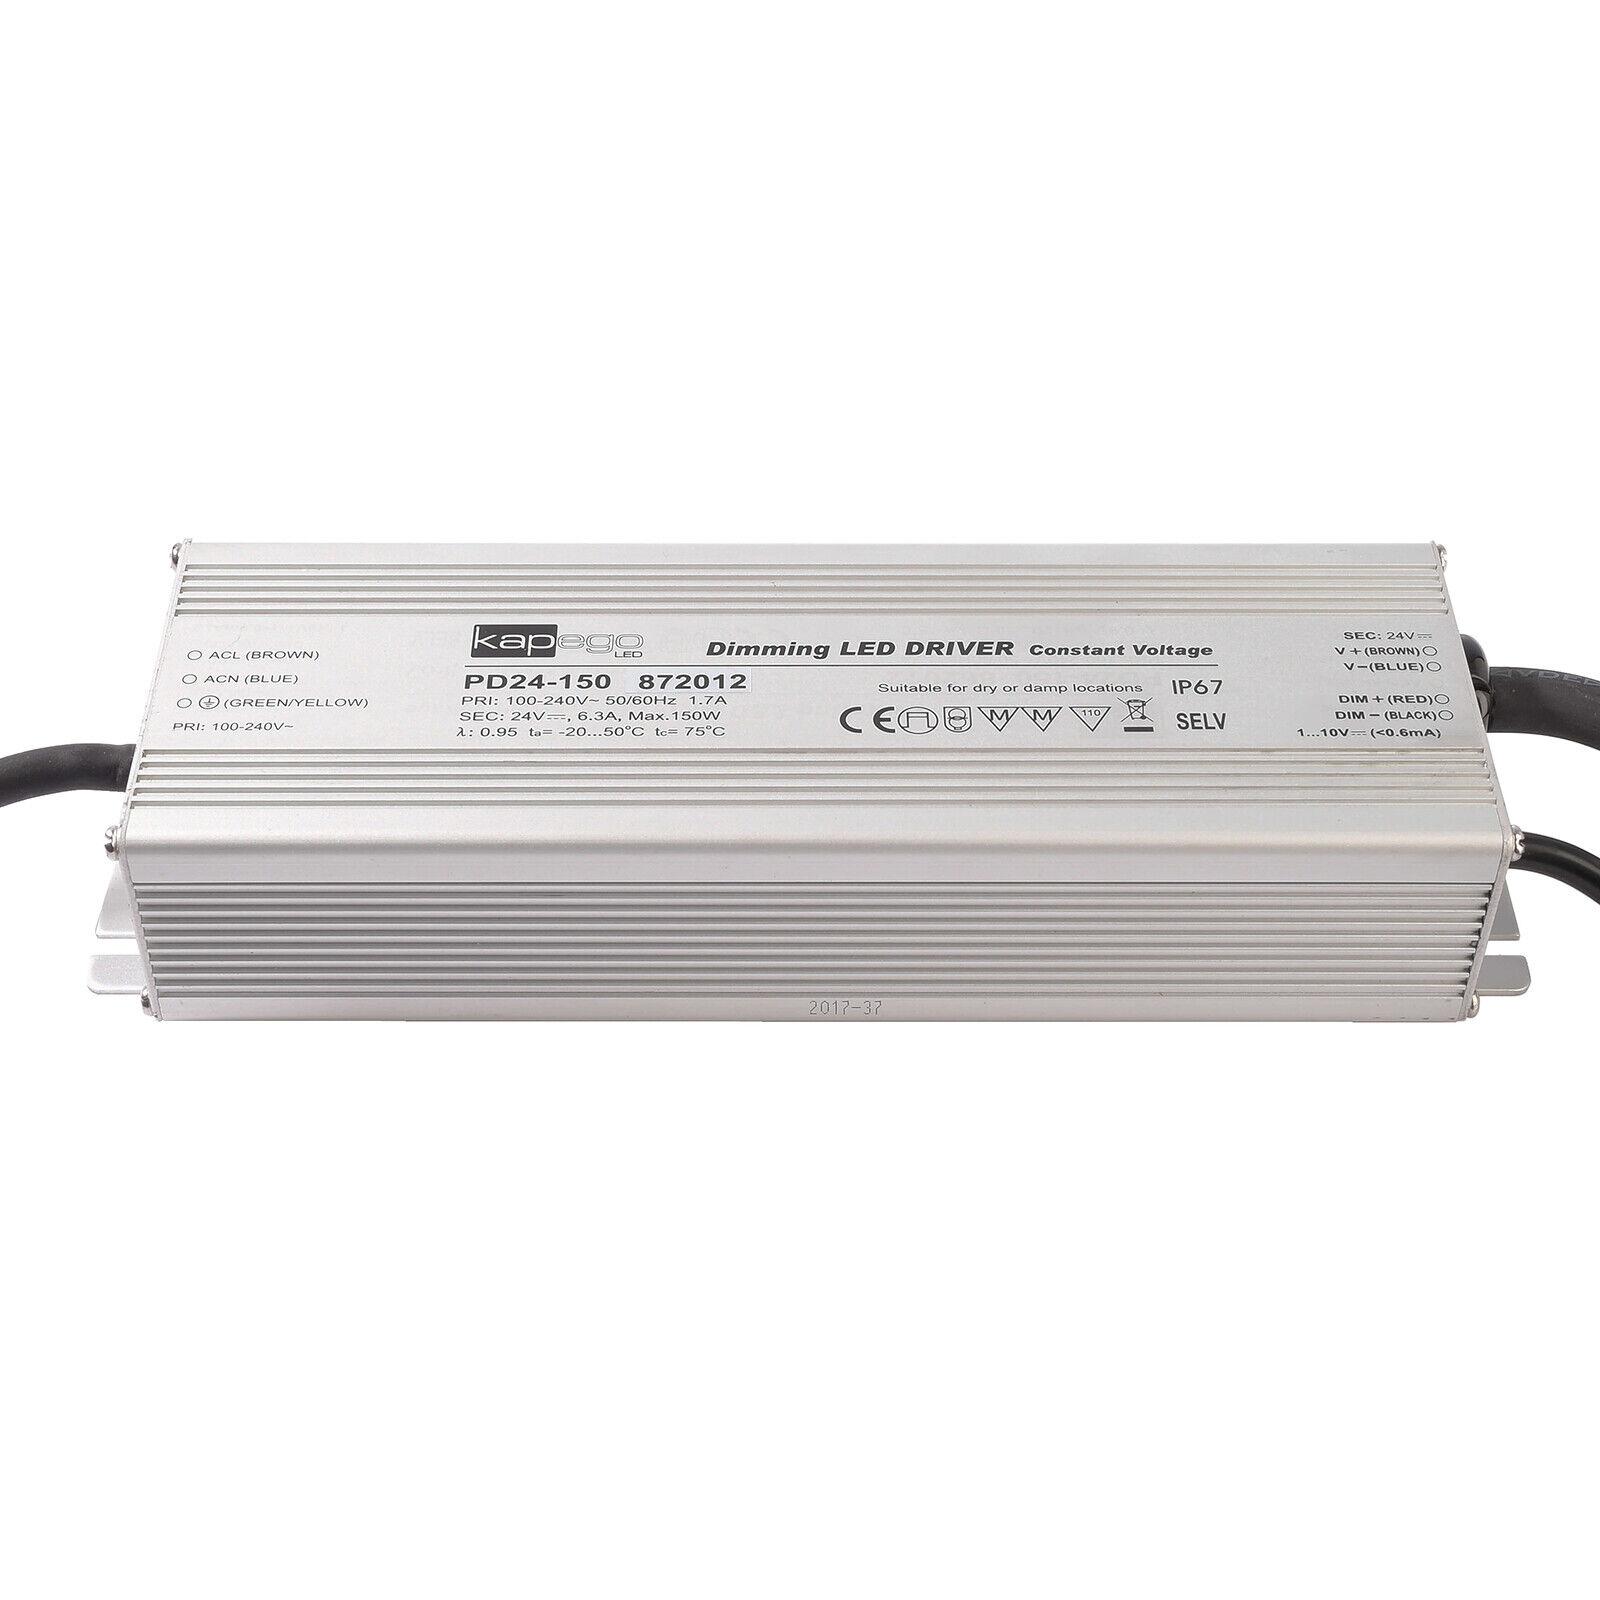 Netzteil Dimmbar 1-10V Leistung 150W 24V 6.25A Außen Lichter LED IP67